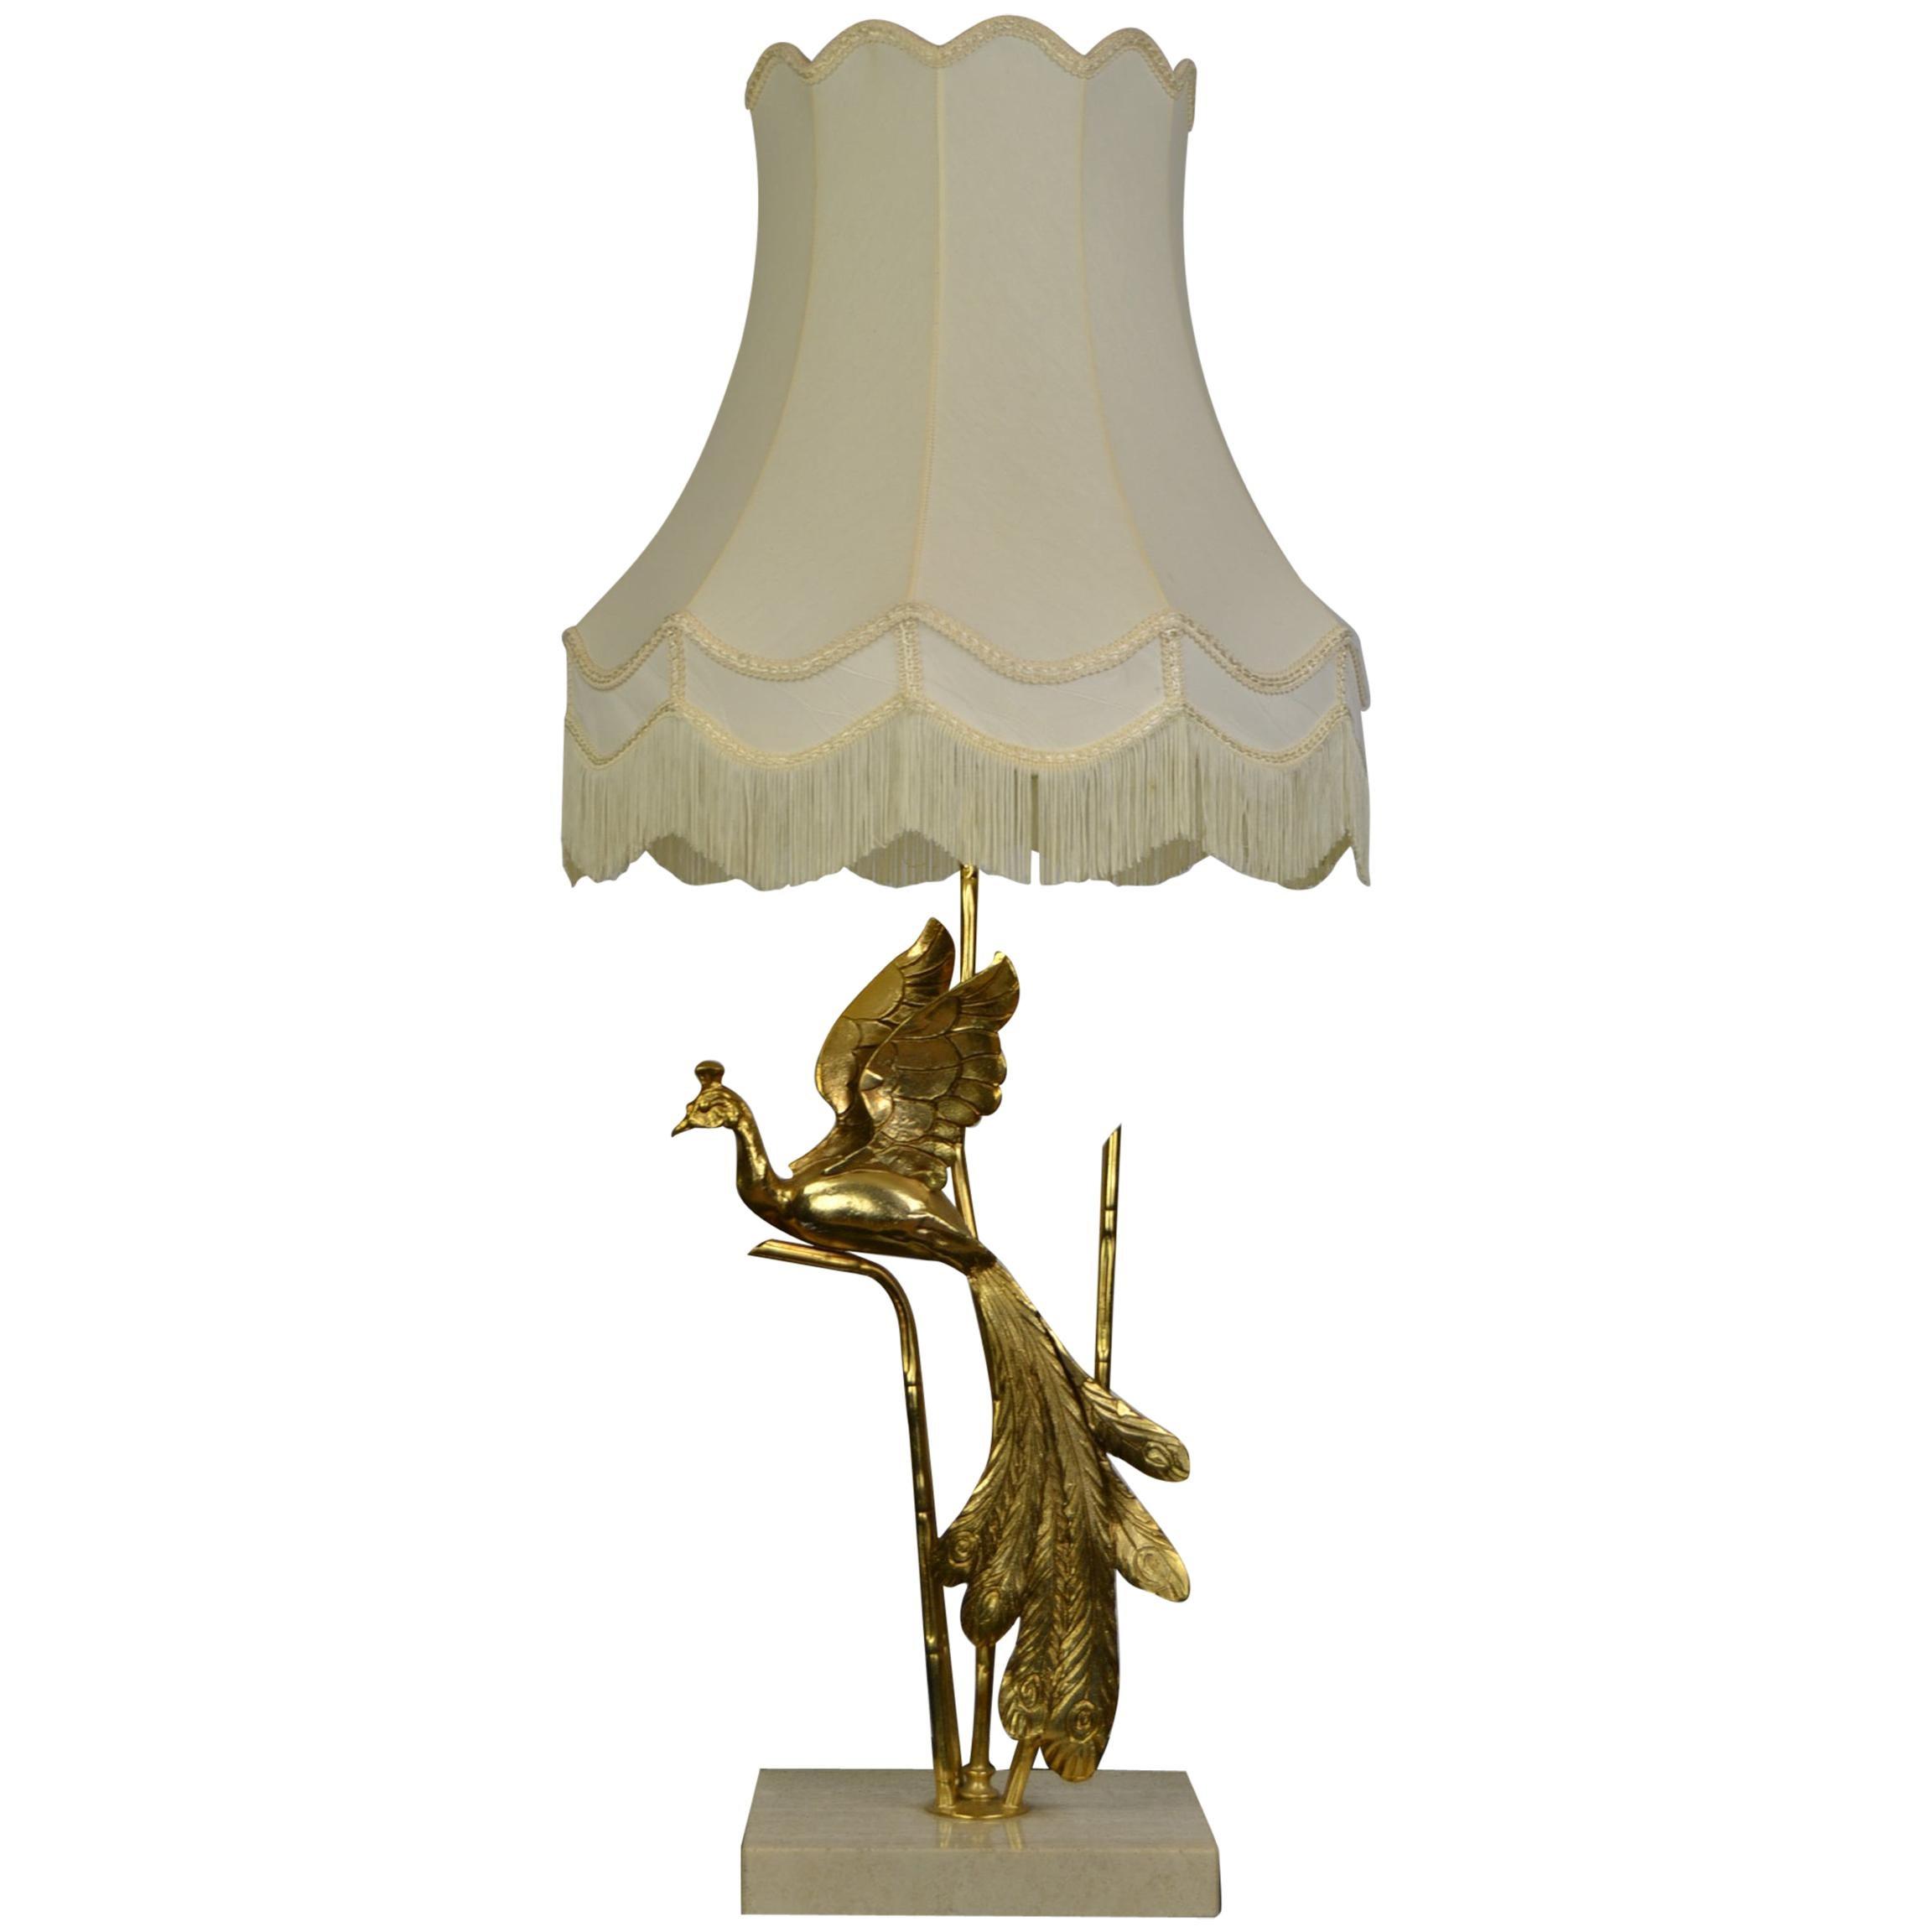 Large Lanciotto Galeotti Peacock Table Lamp for L'Originale, Italy, 1970s